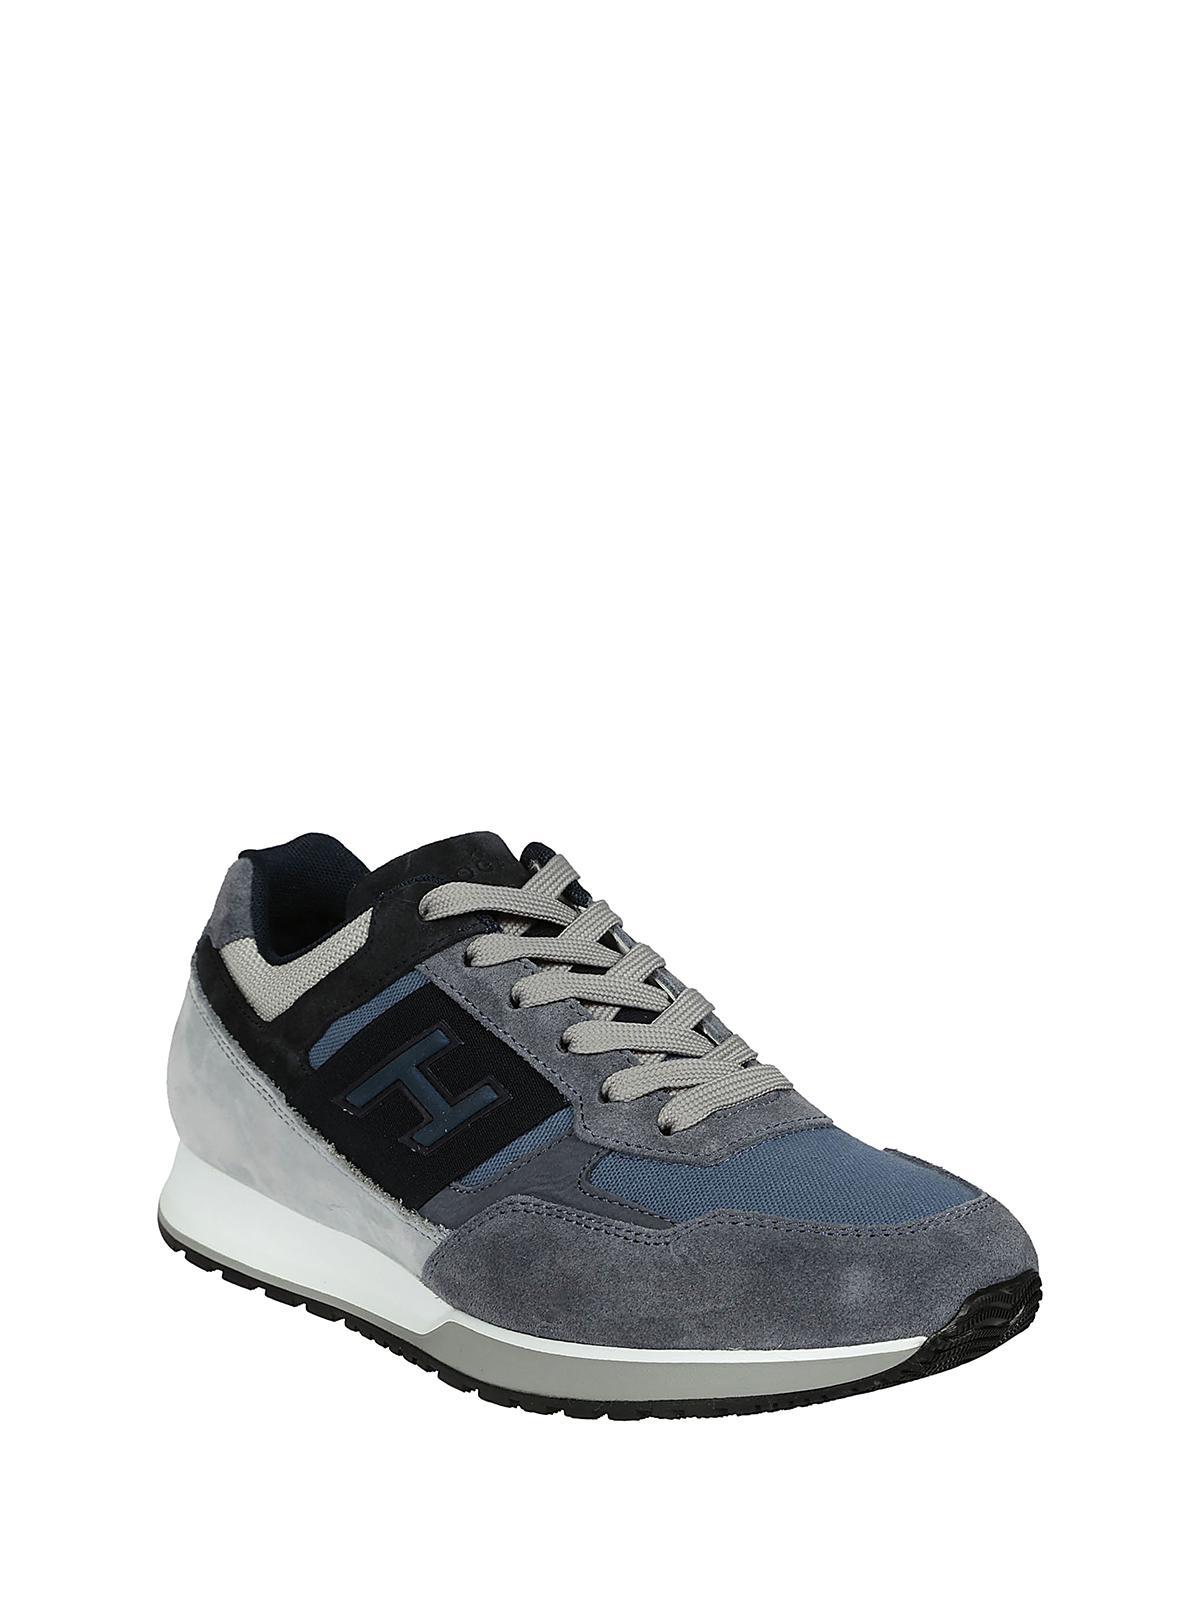 Hogan - Baskets - H321 - Chaussures de sport - HXM3210K790IJE973G 4429ea86a49f